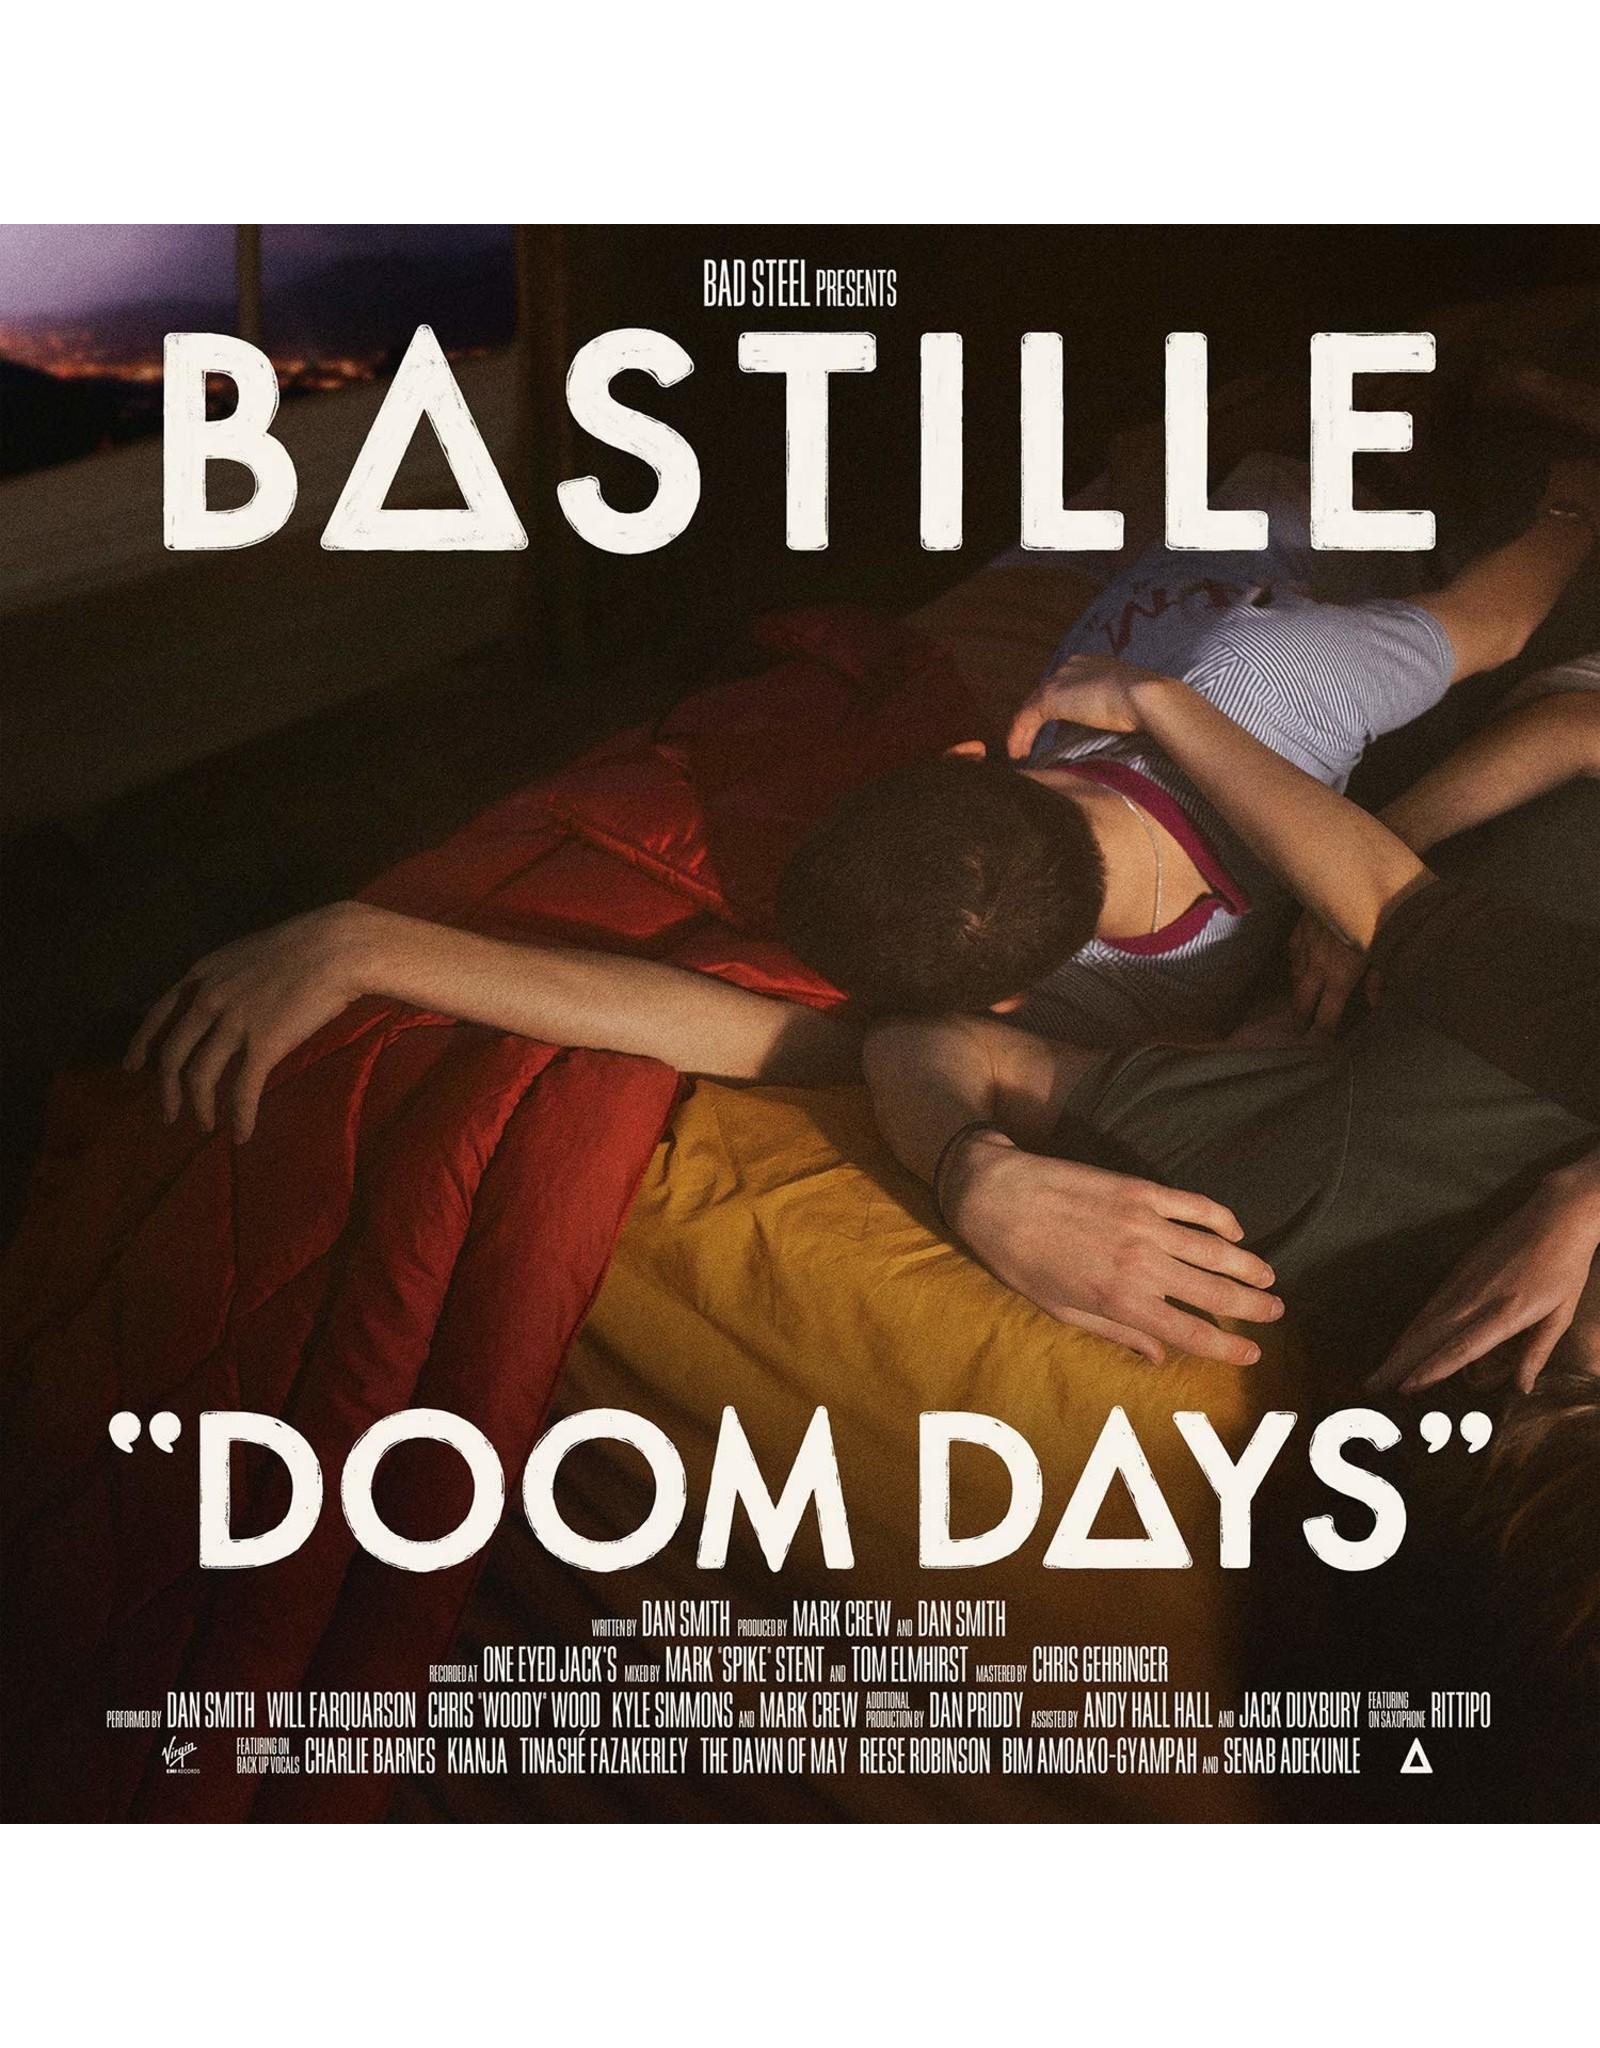 Bastille - Doom Days CD